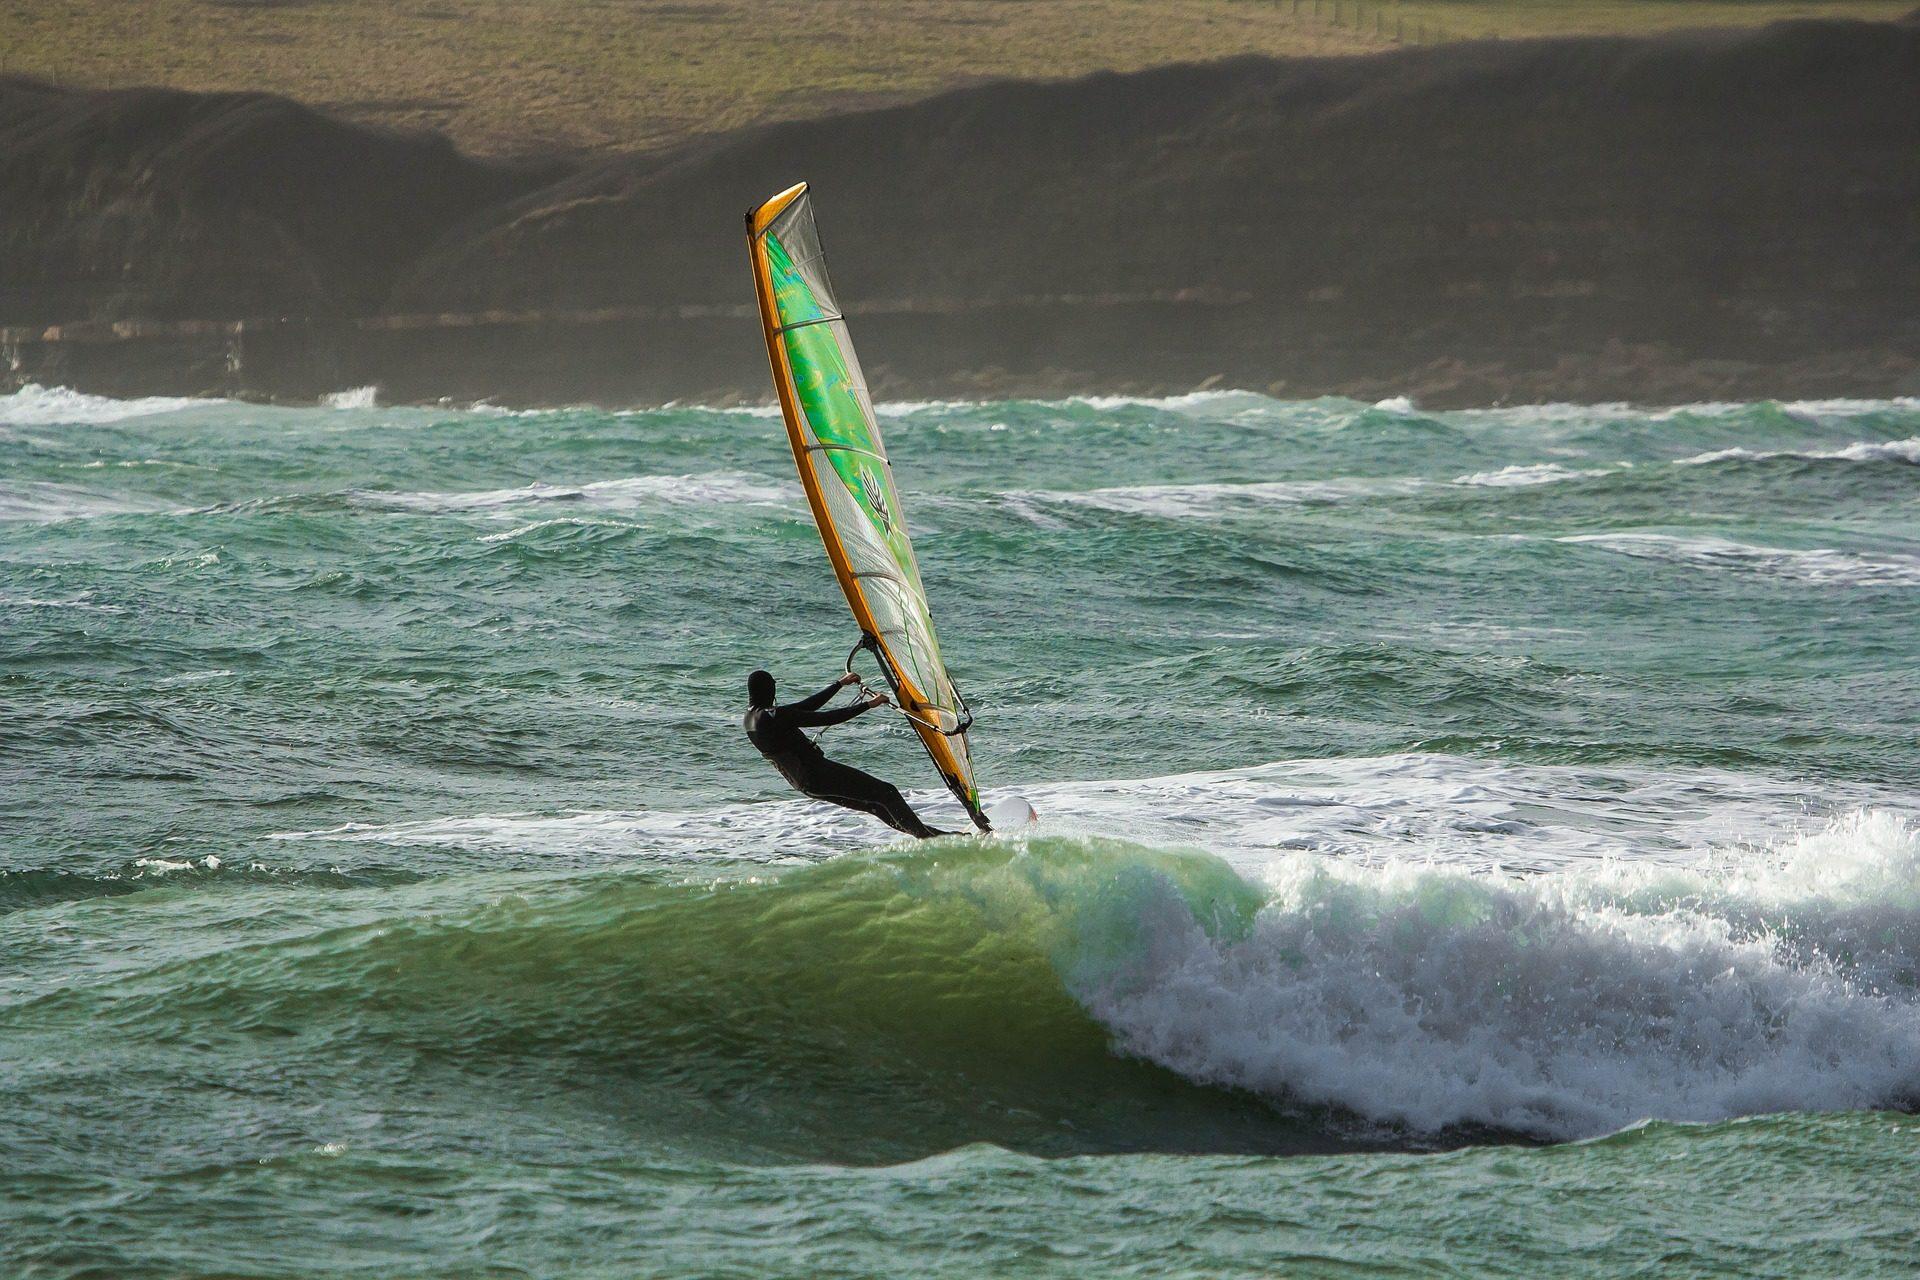 Surf, windsurf, Wellen, Meer, Risiko, Wind - Wallpaper HD - Prof.-falken.com